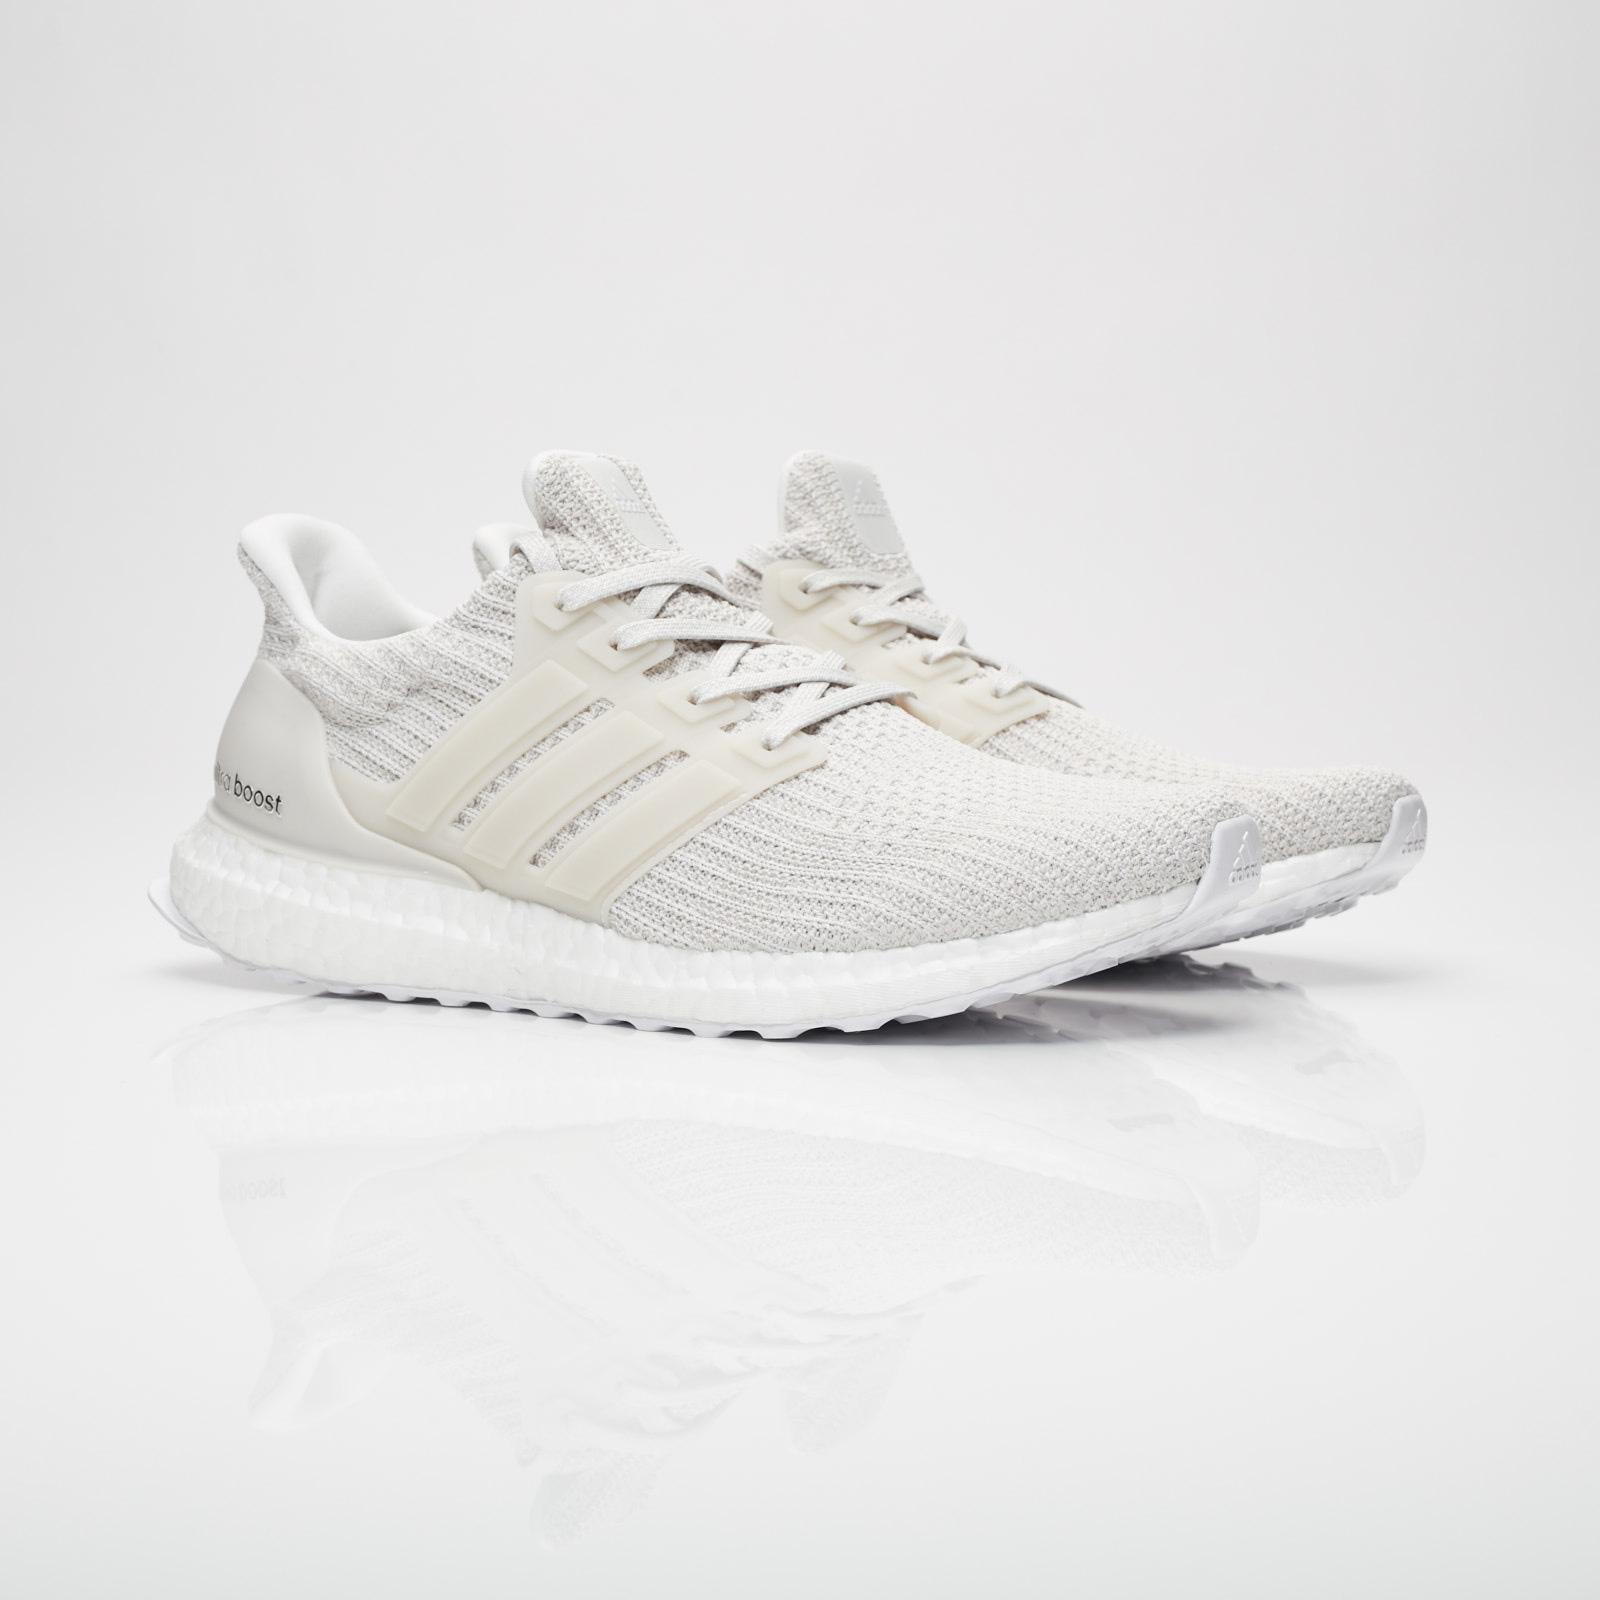 99722f42e0d adidas UltraBOOST - Bb6177 - Sneakersnstuff